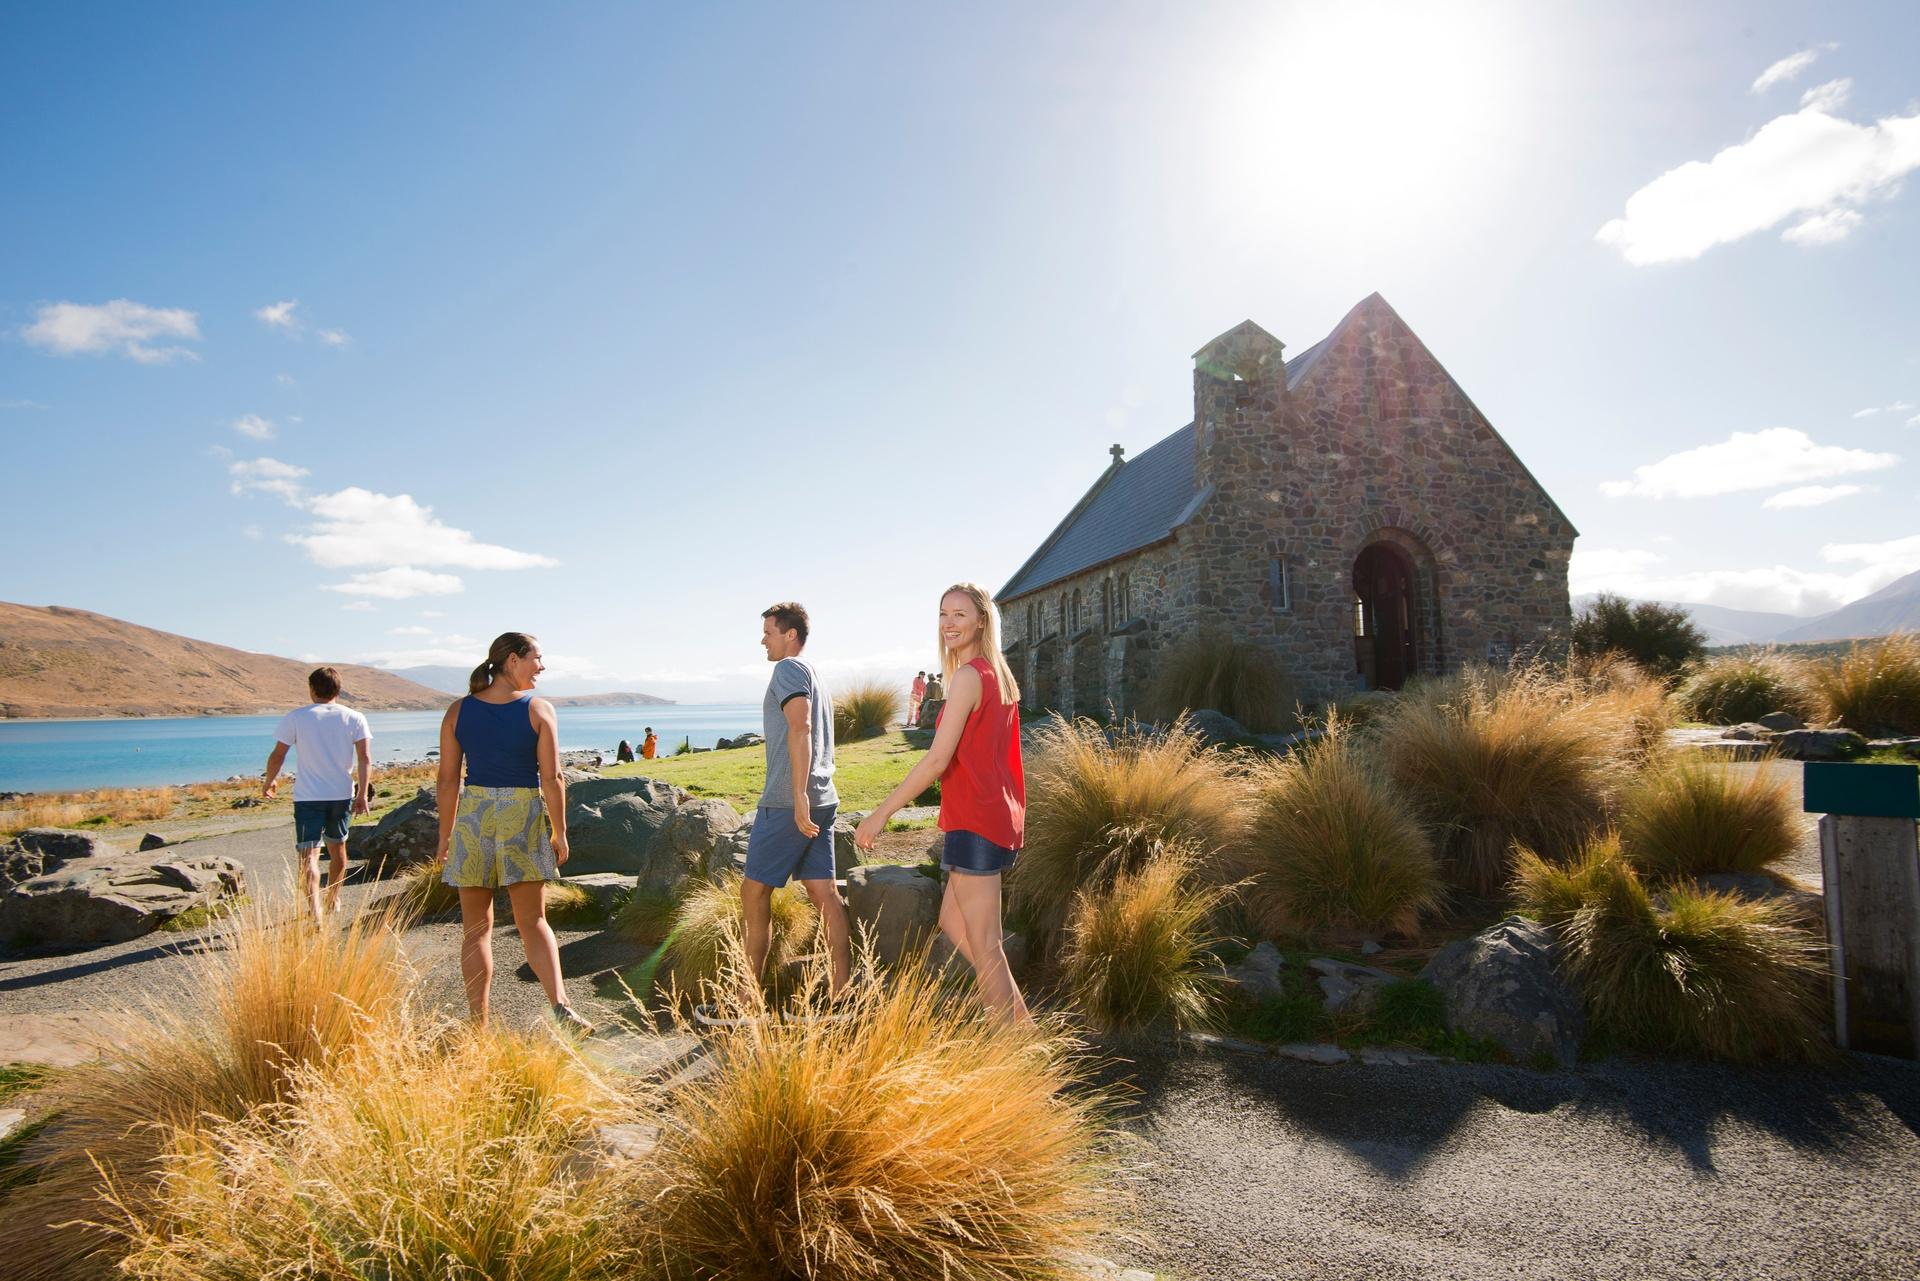 The Church of the Good Shepherd, Lake Tekapō (image care of Tourism New Zealand).